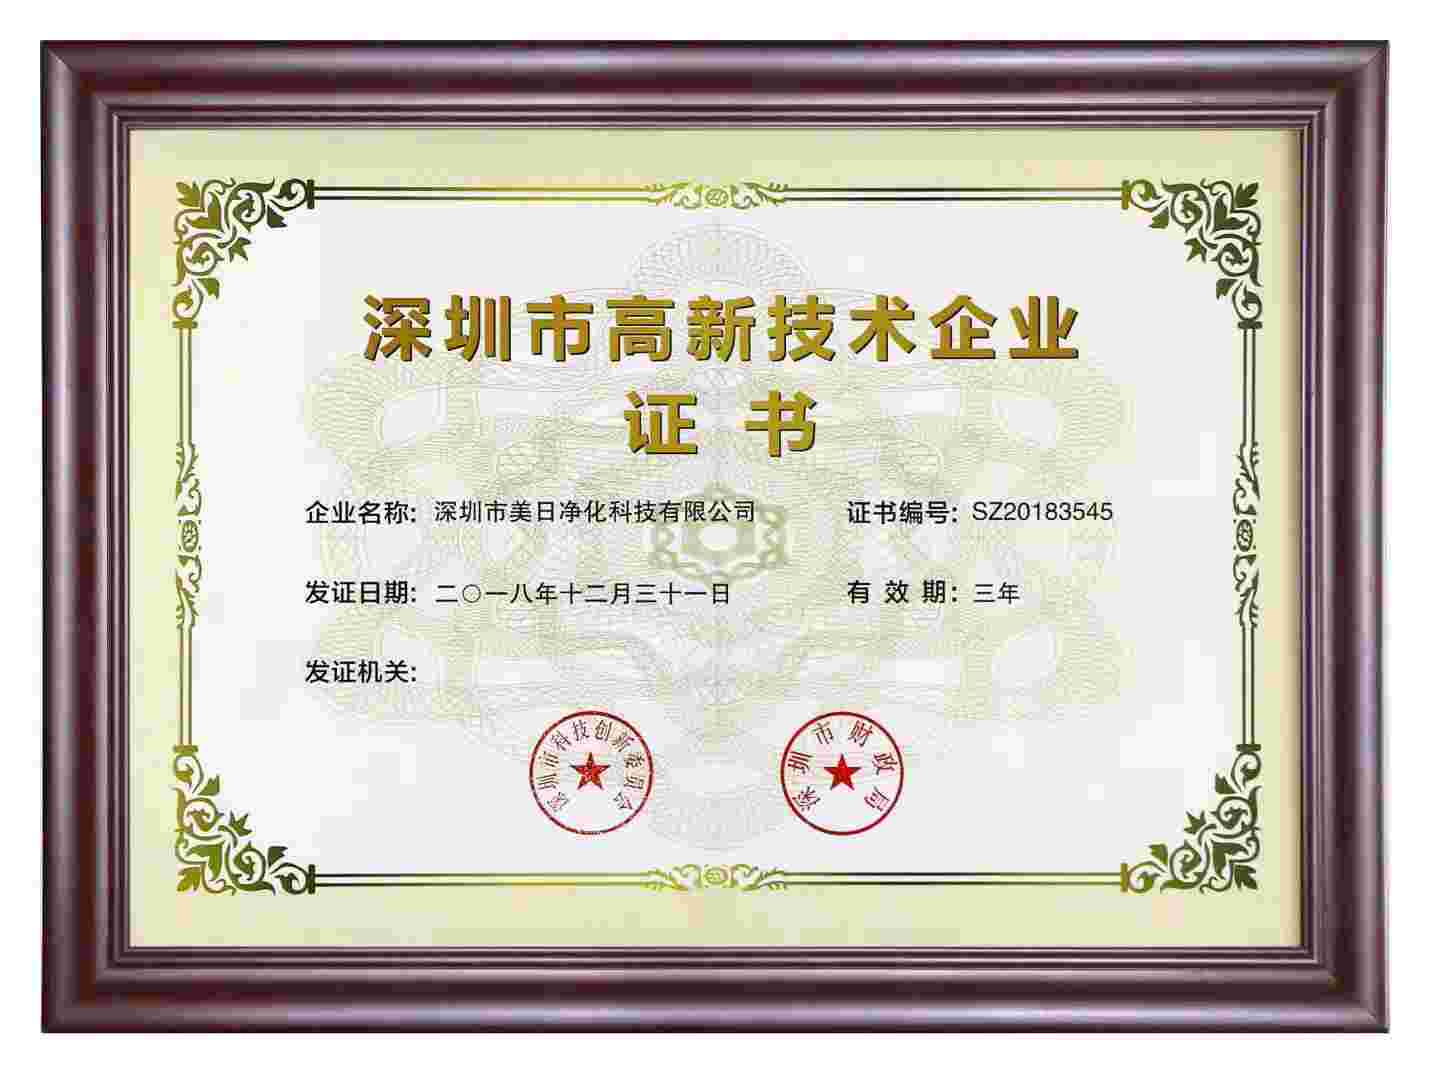 ffu洁净净化单元设备证书